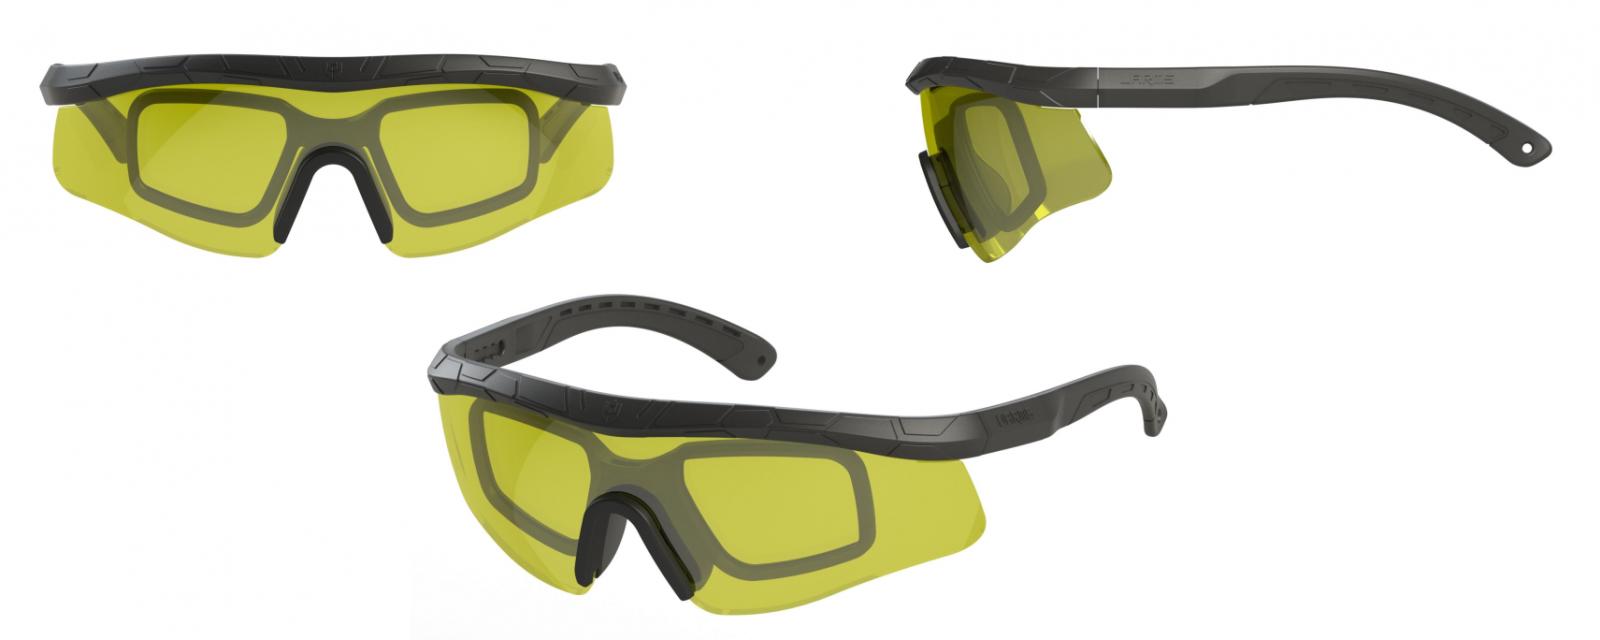 Ballistic glasses